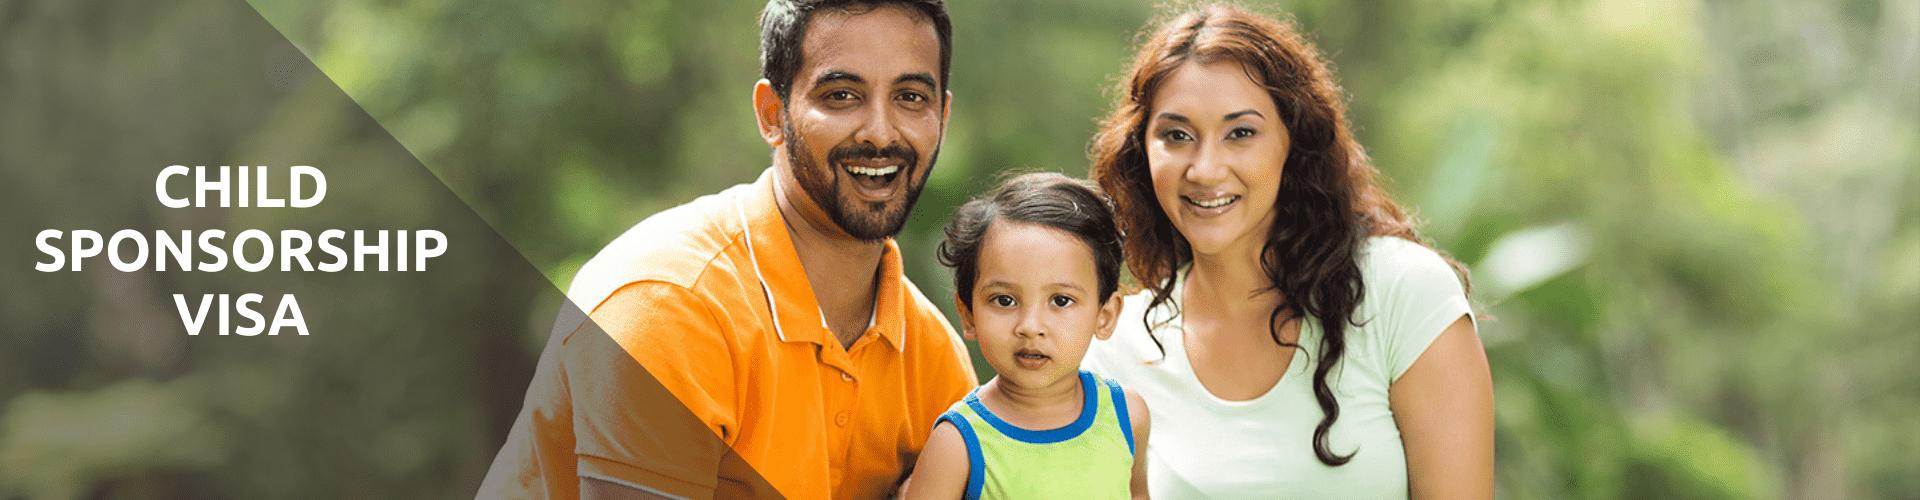 Child Sponsorship Visa